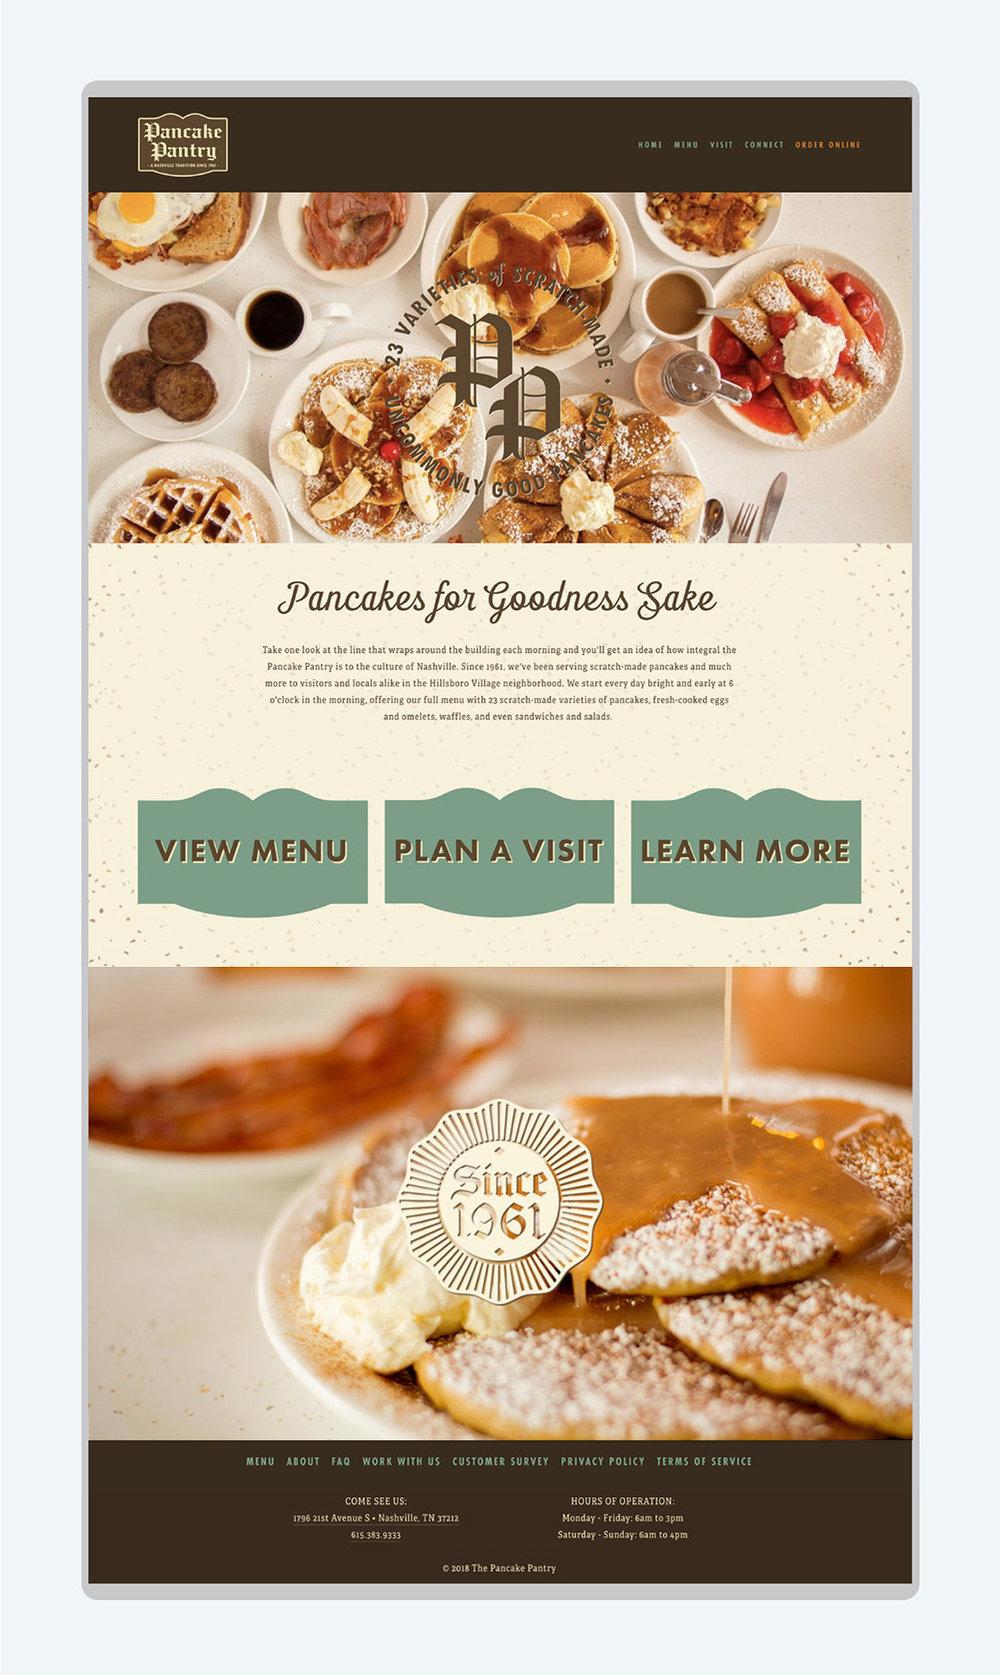 PancakePantry_Web_Mockup-2.jpg